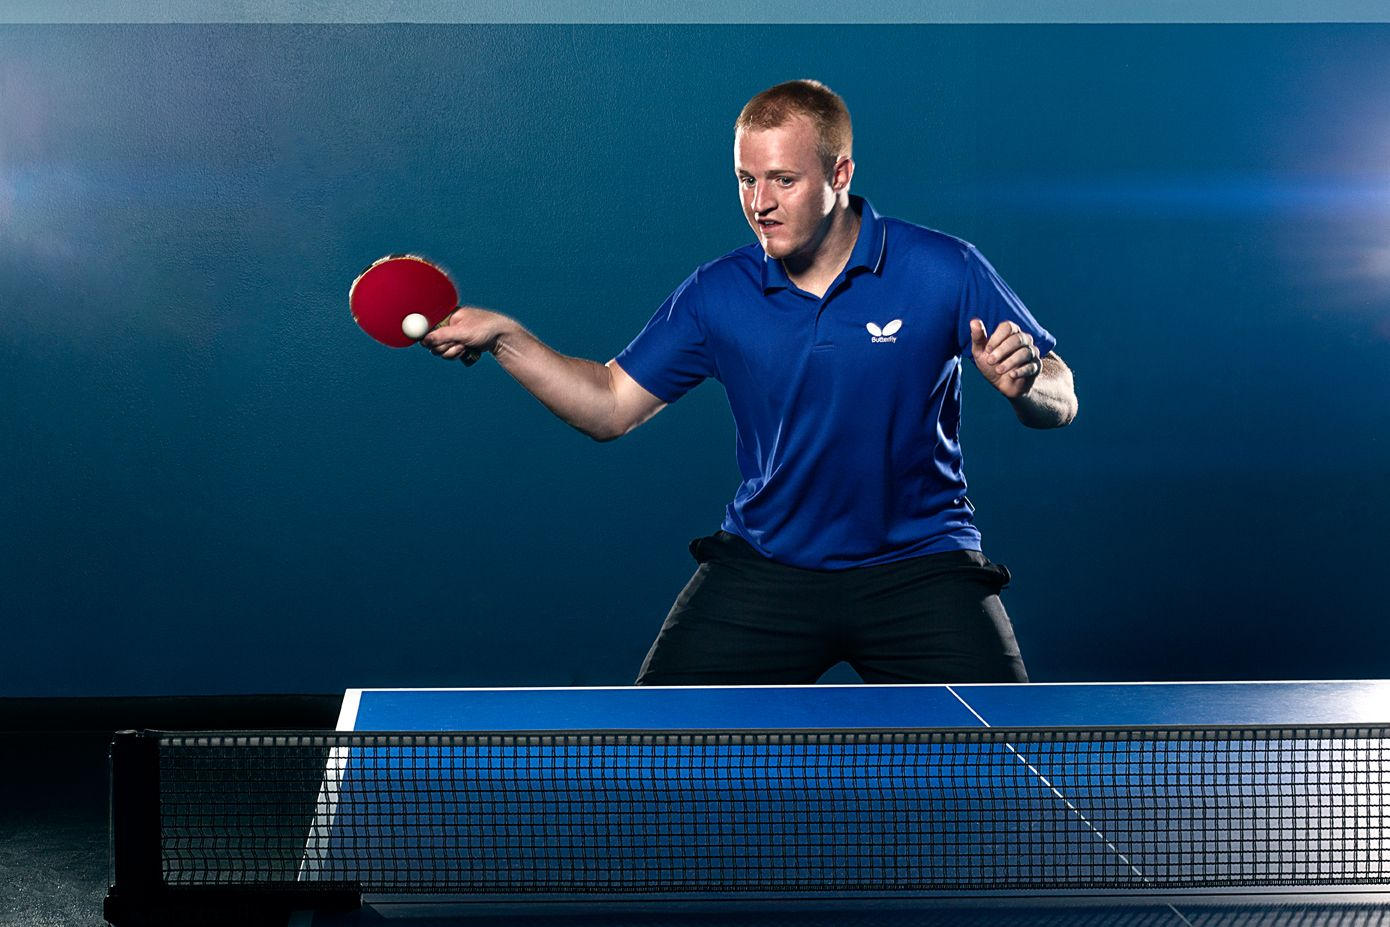 Advertising photos for the Utah Table Tennis Training